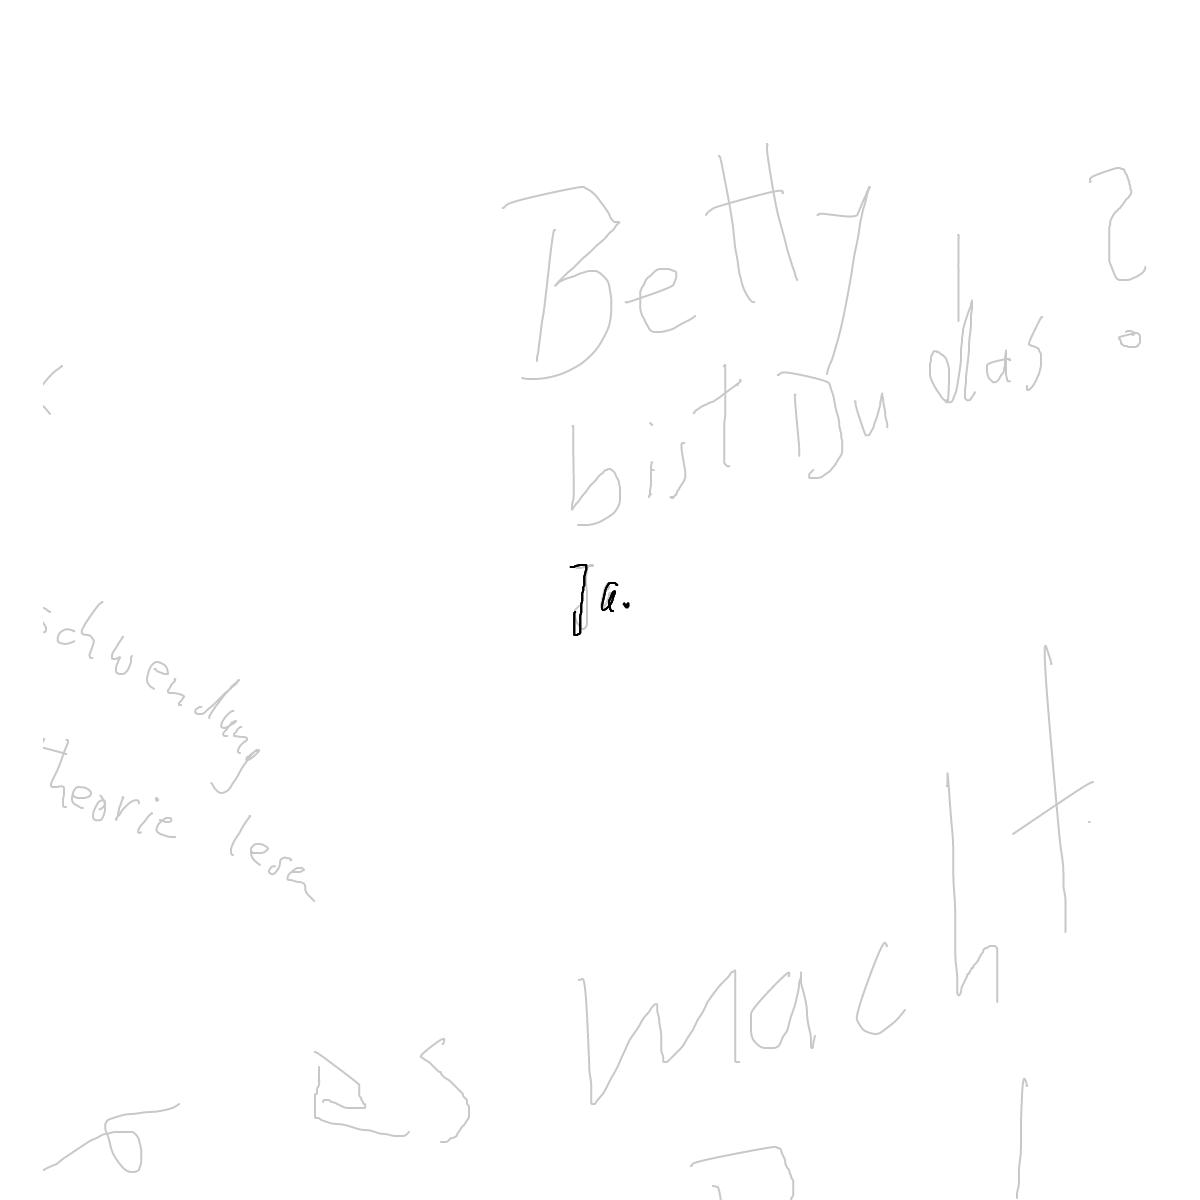 BAAAM drawing#6190 lat:52.4879302978515600lng: 13.4254016876220700